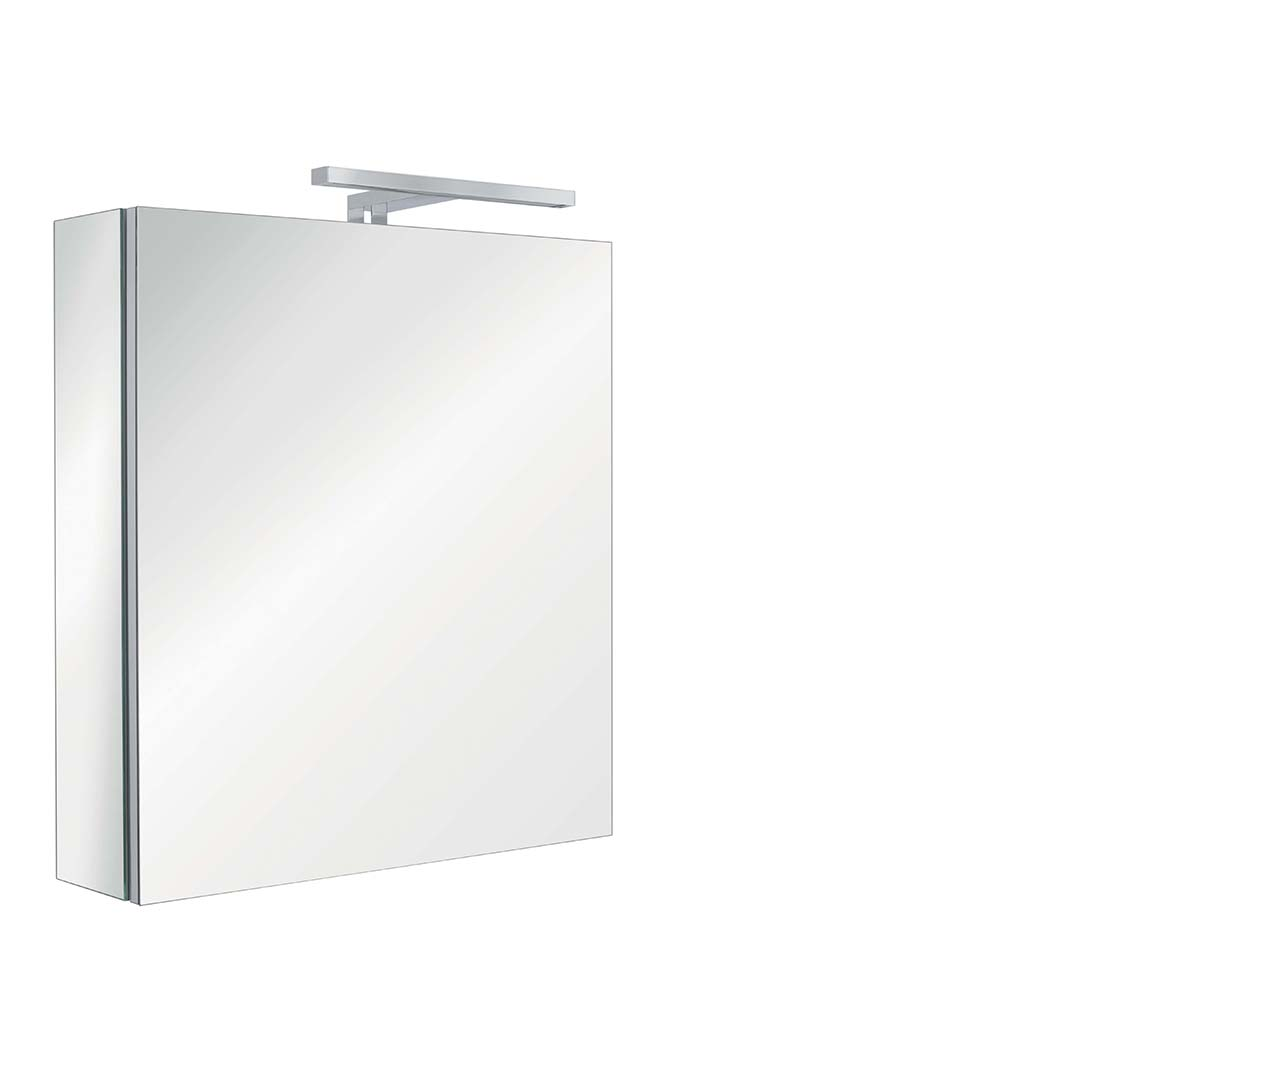 Gamme Box, armoire de salle de bain, armoire toilette - Sanijura